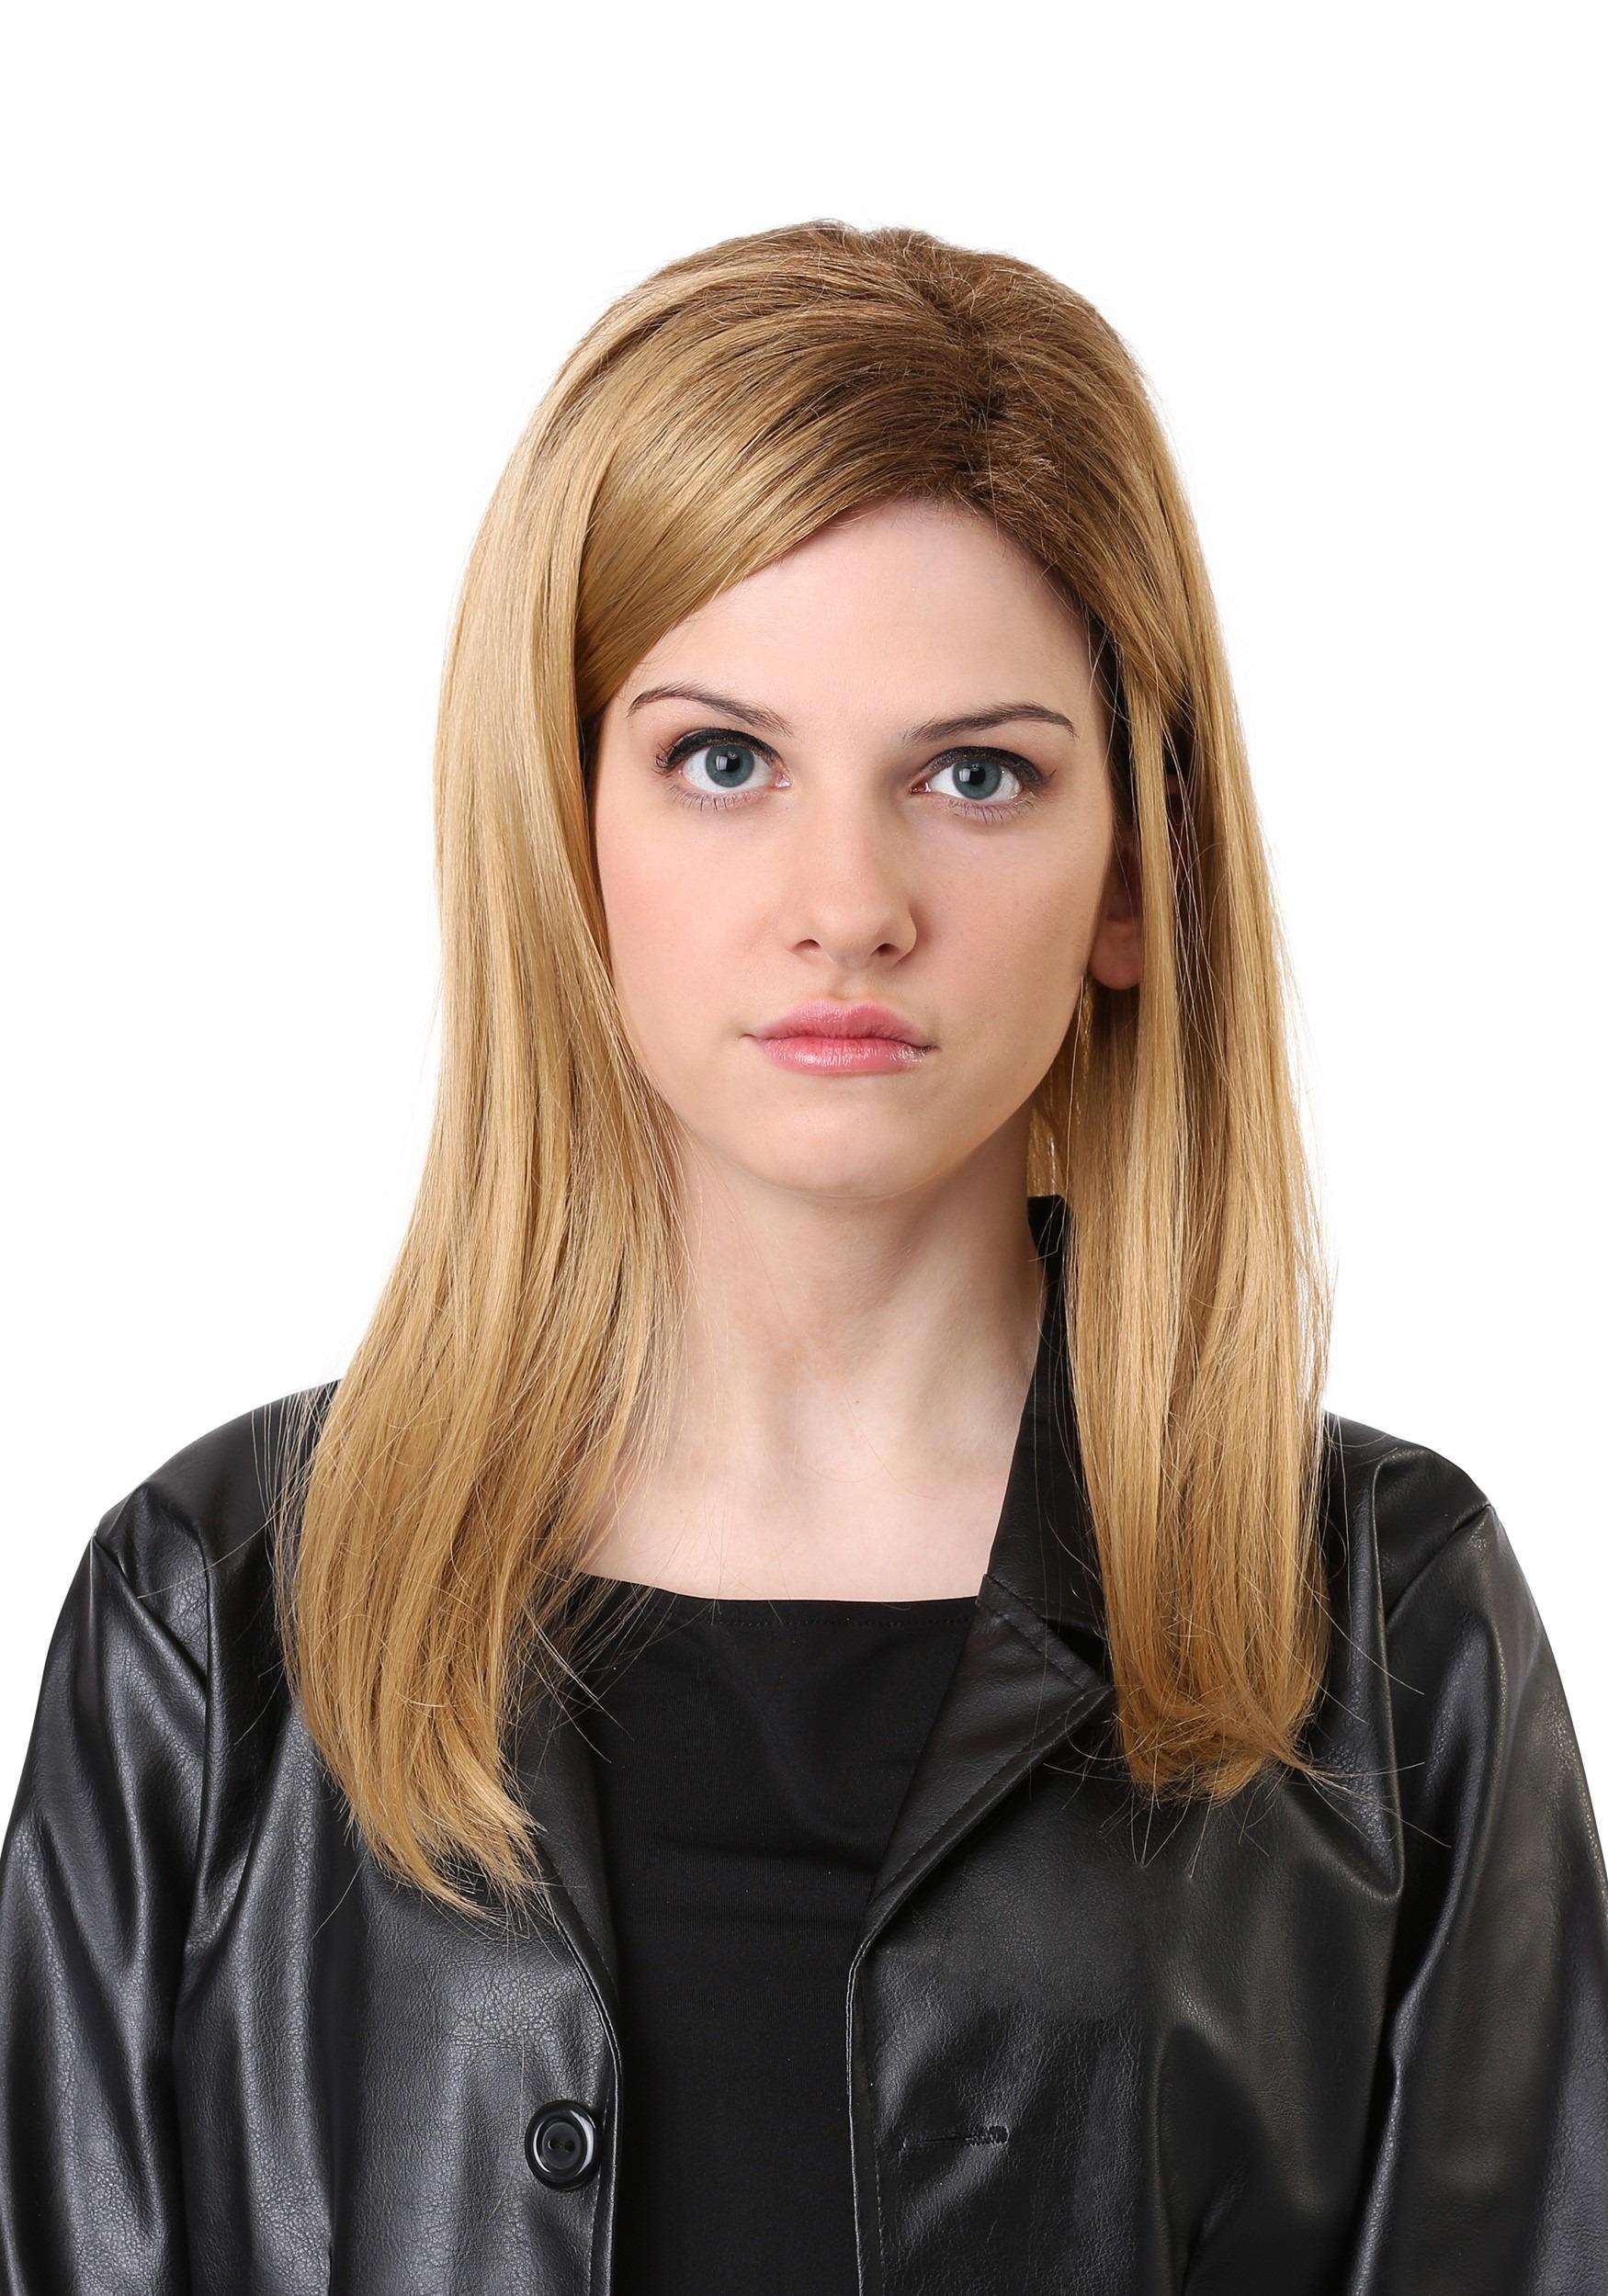 Buffy the Vampire Slayer Adult Wig